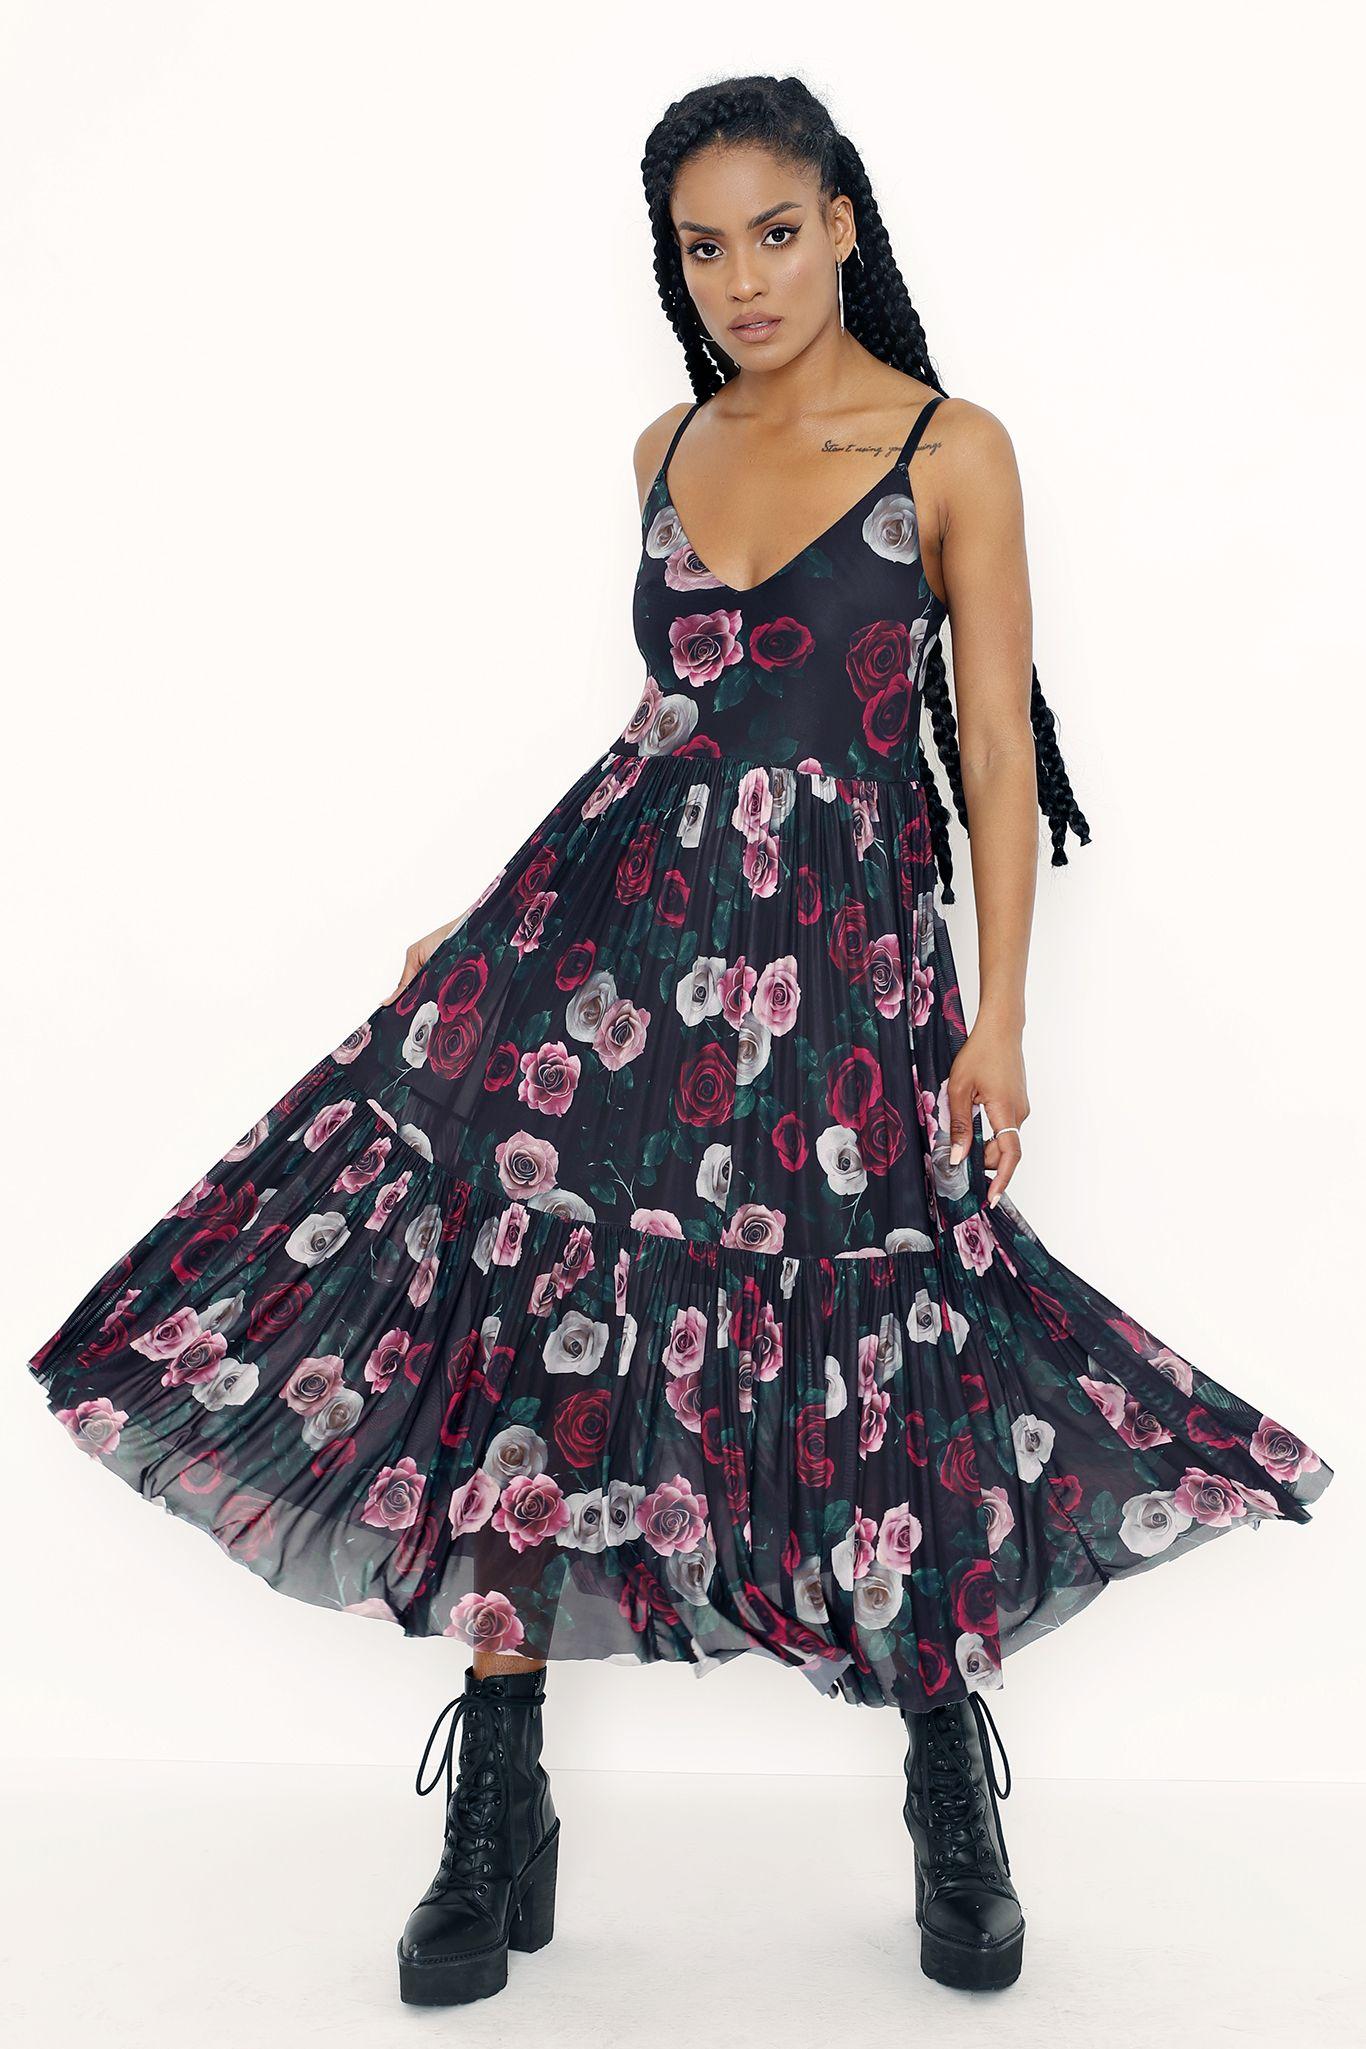 Dark Roses Sheer Midaxi Dress Limited In 2021 Dresses Black Milk Black Milk Clothing [ 2049 x 1366 Pixel ]